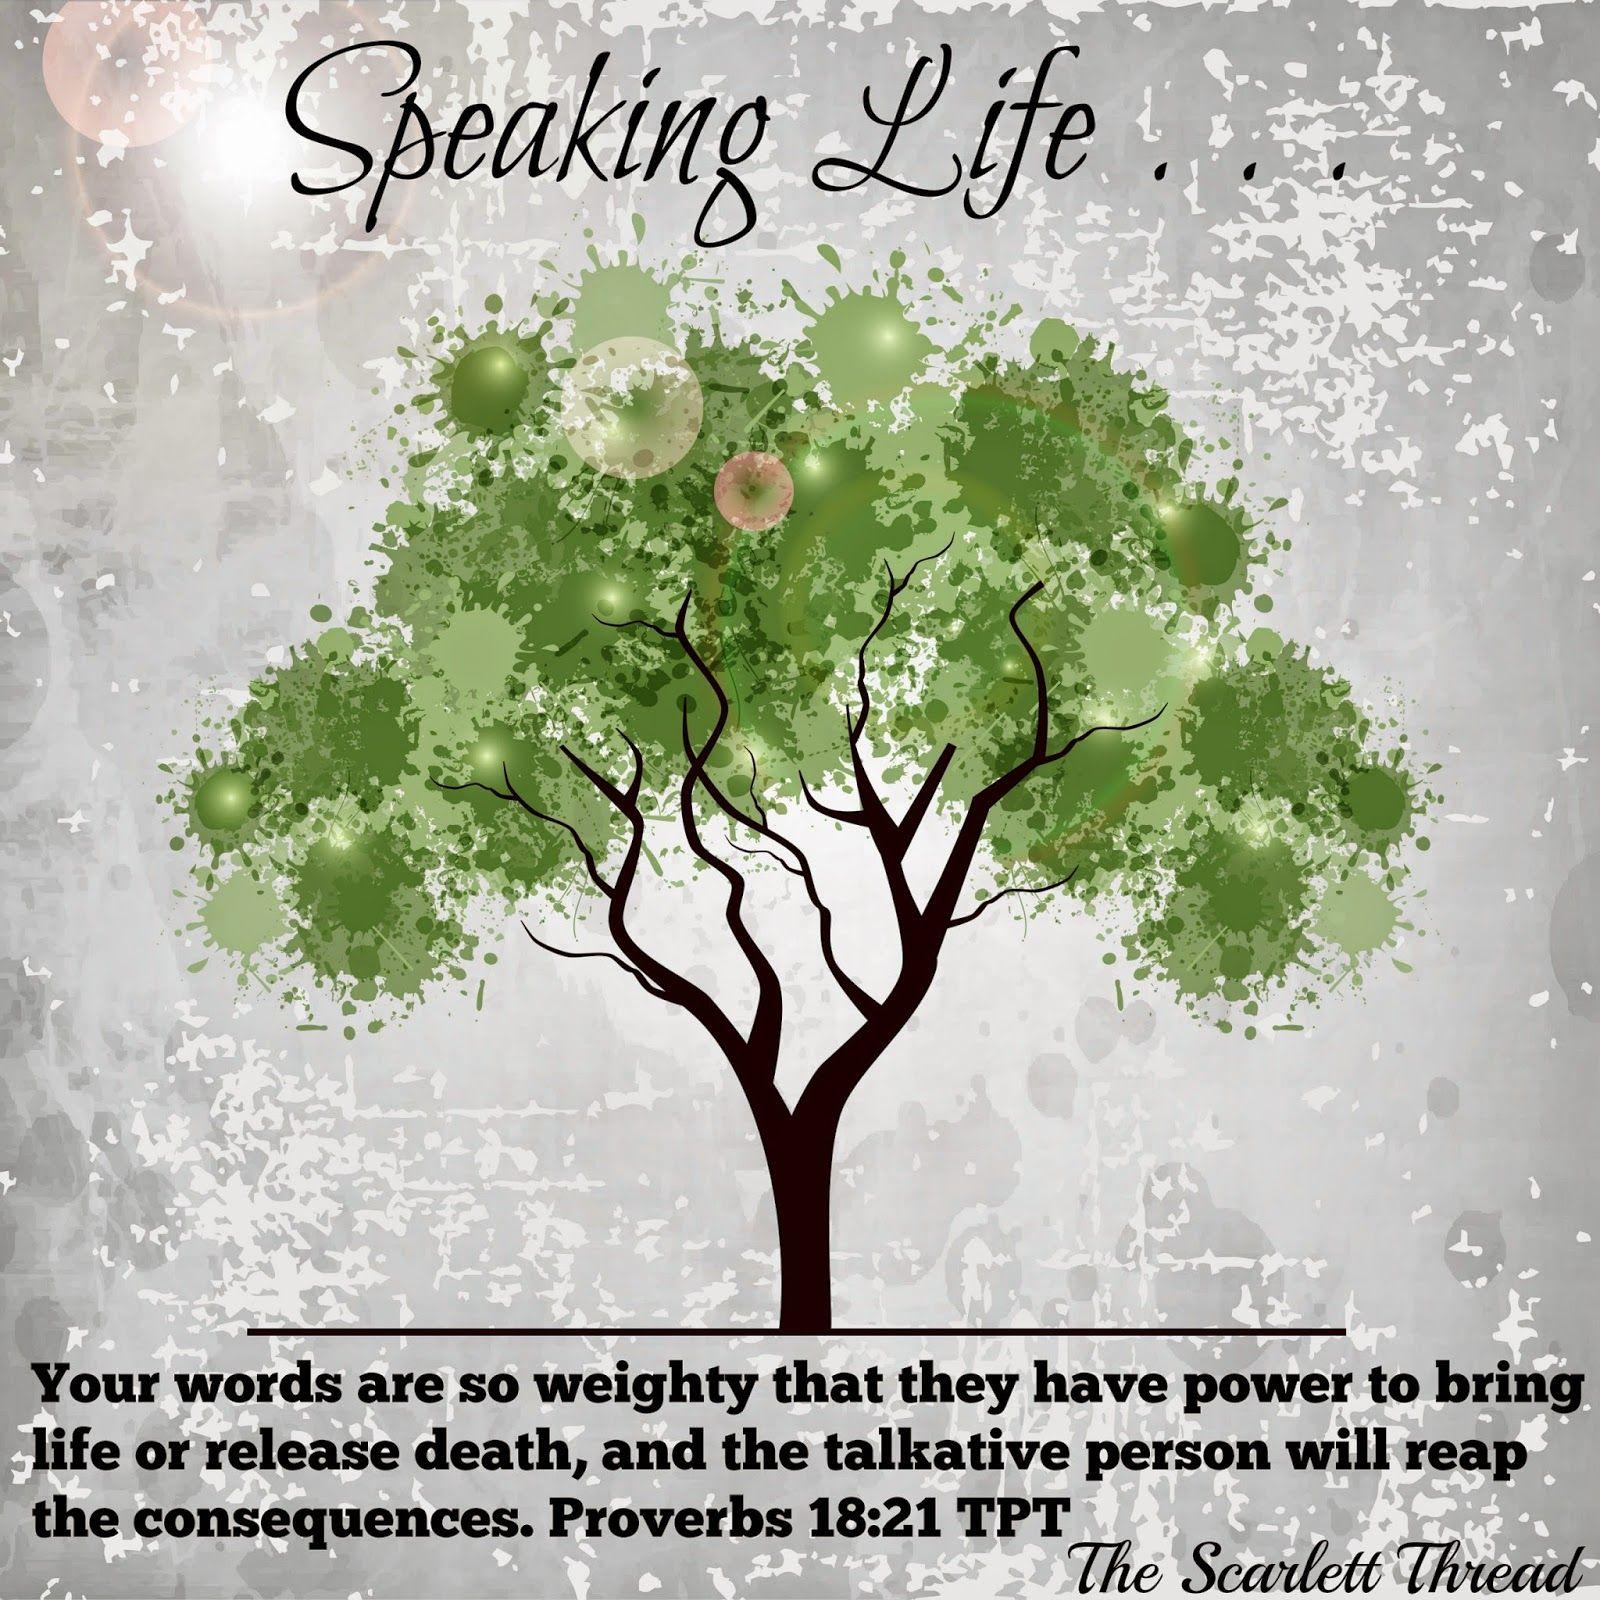 The Scarlett Thread: Speaking Life . . . Proverbs 18:21